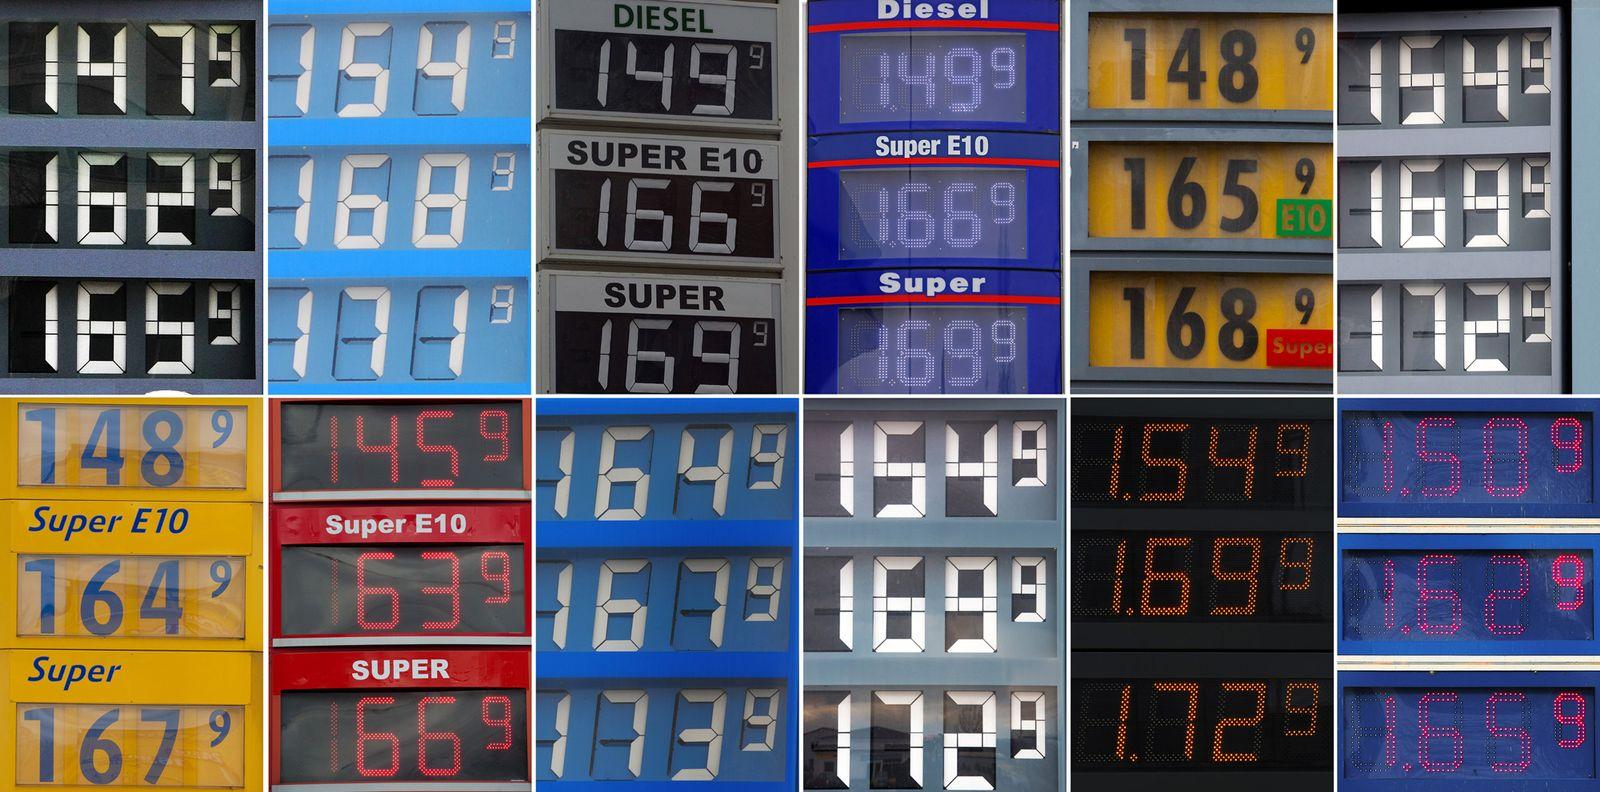 Benzinpreis / Meldestelle / Symbol